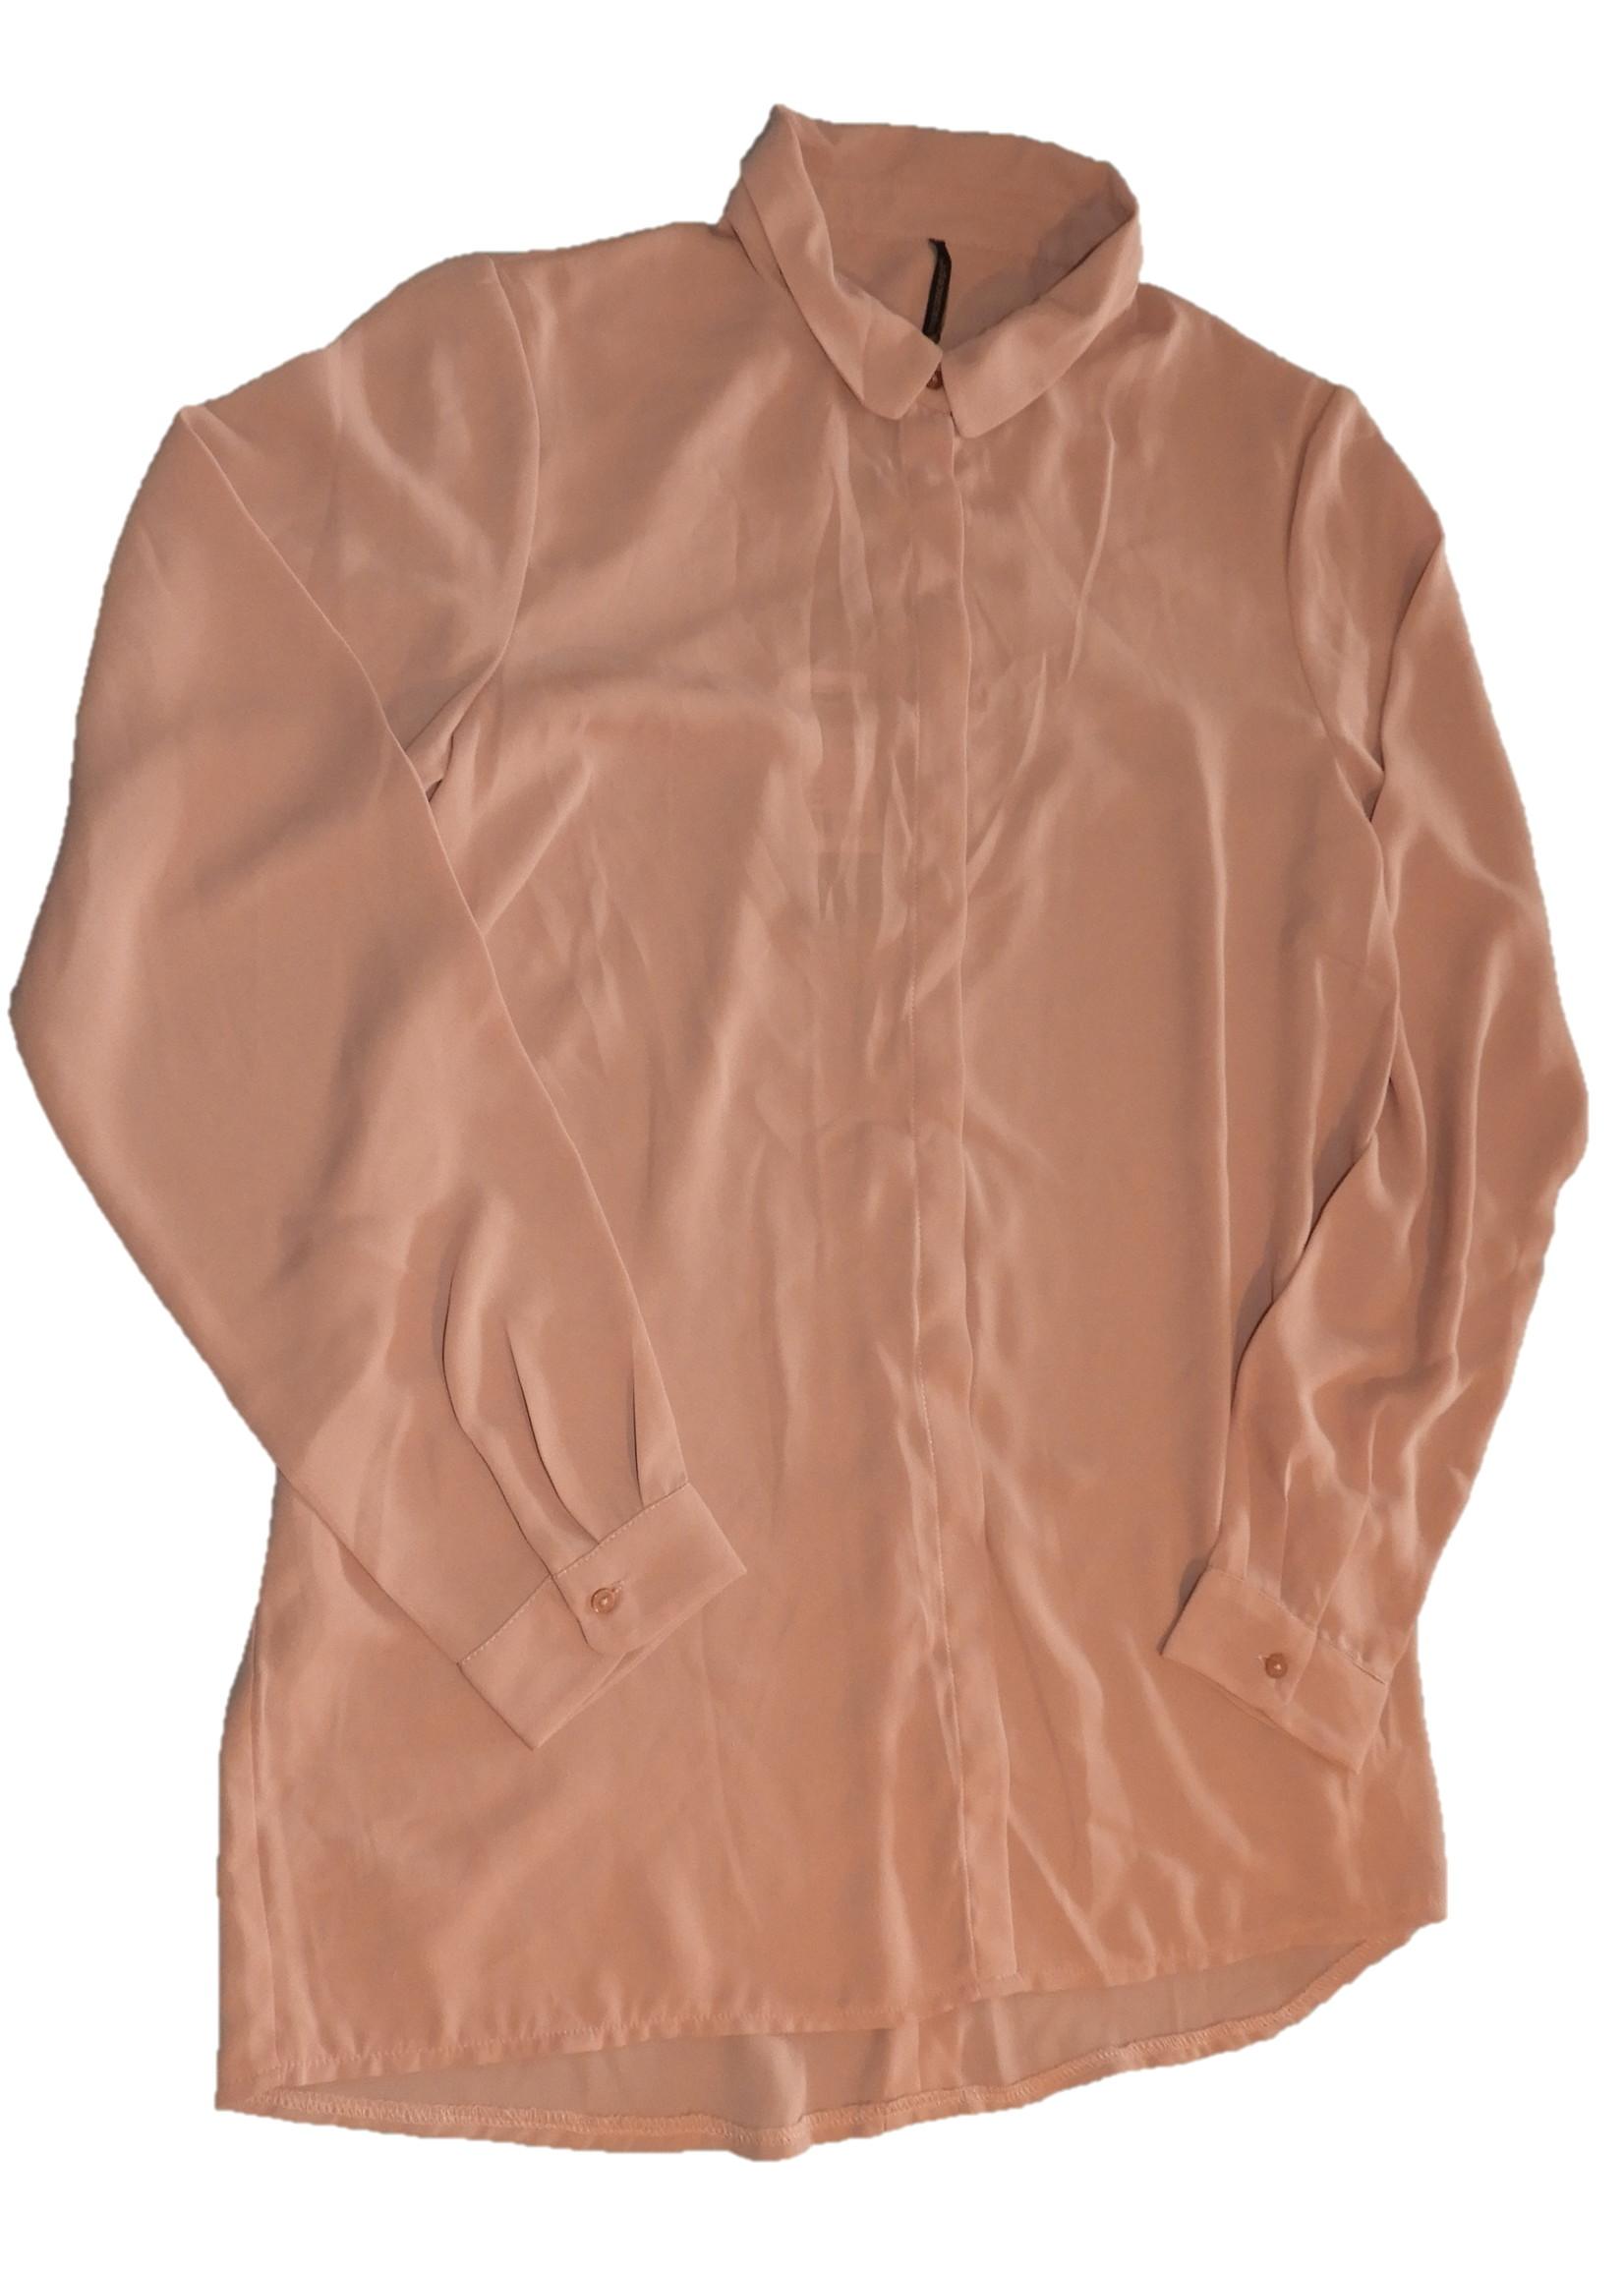 Soya Concept blouse maat S + M